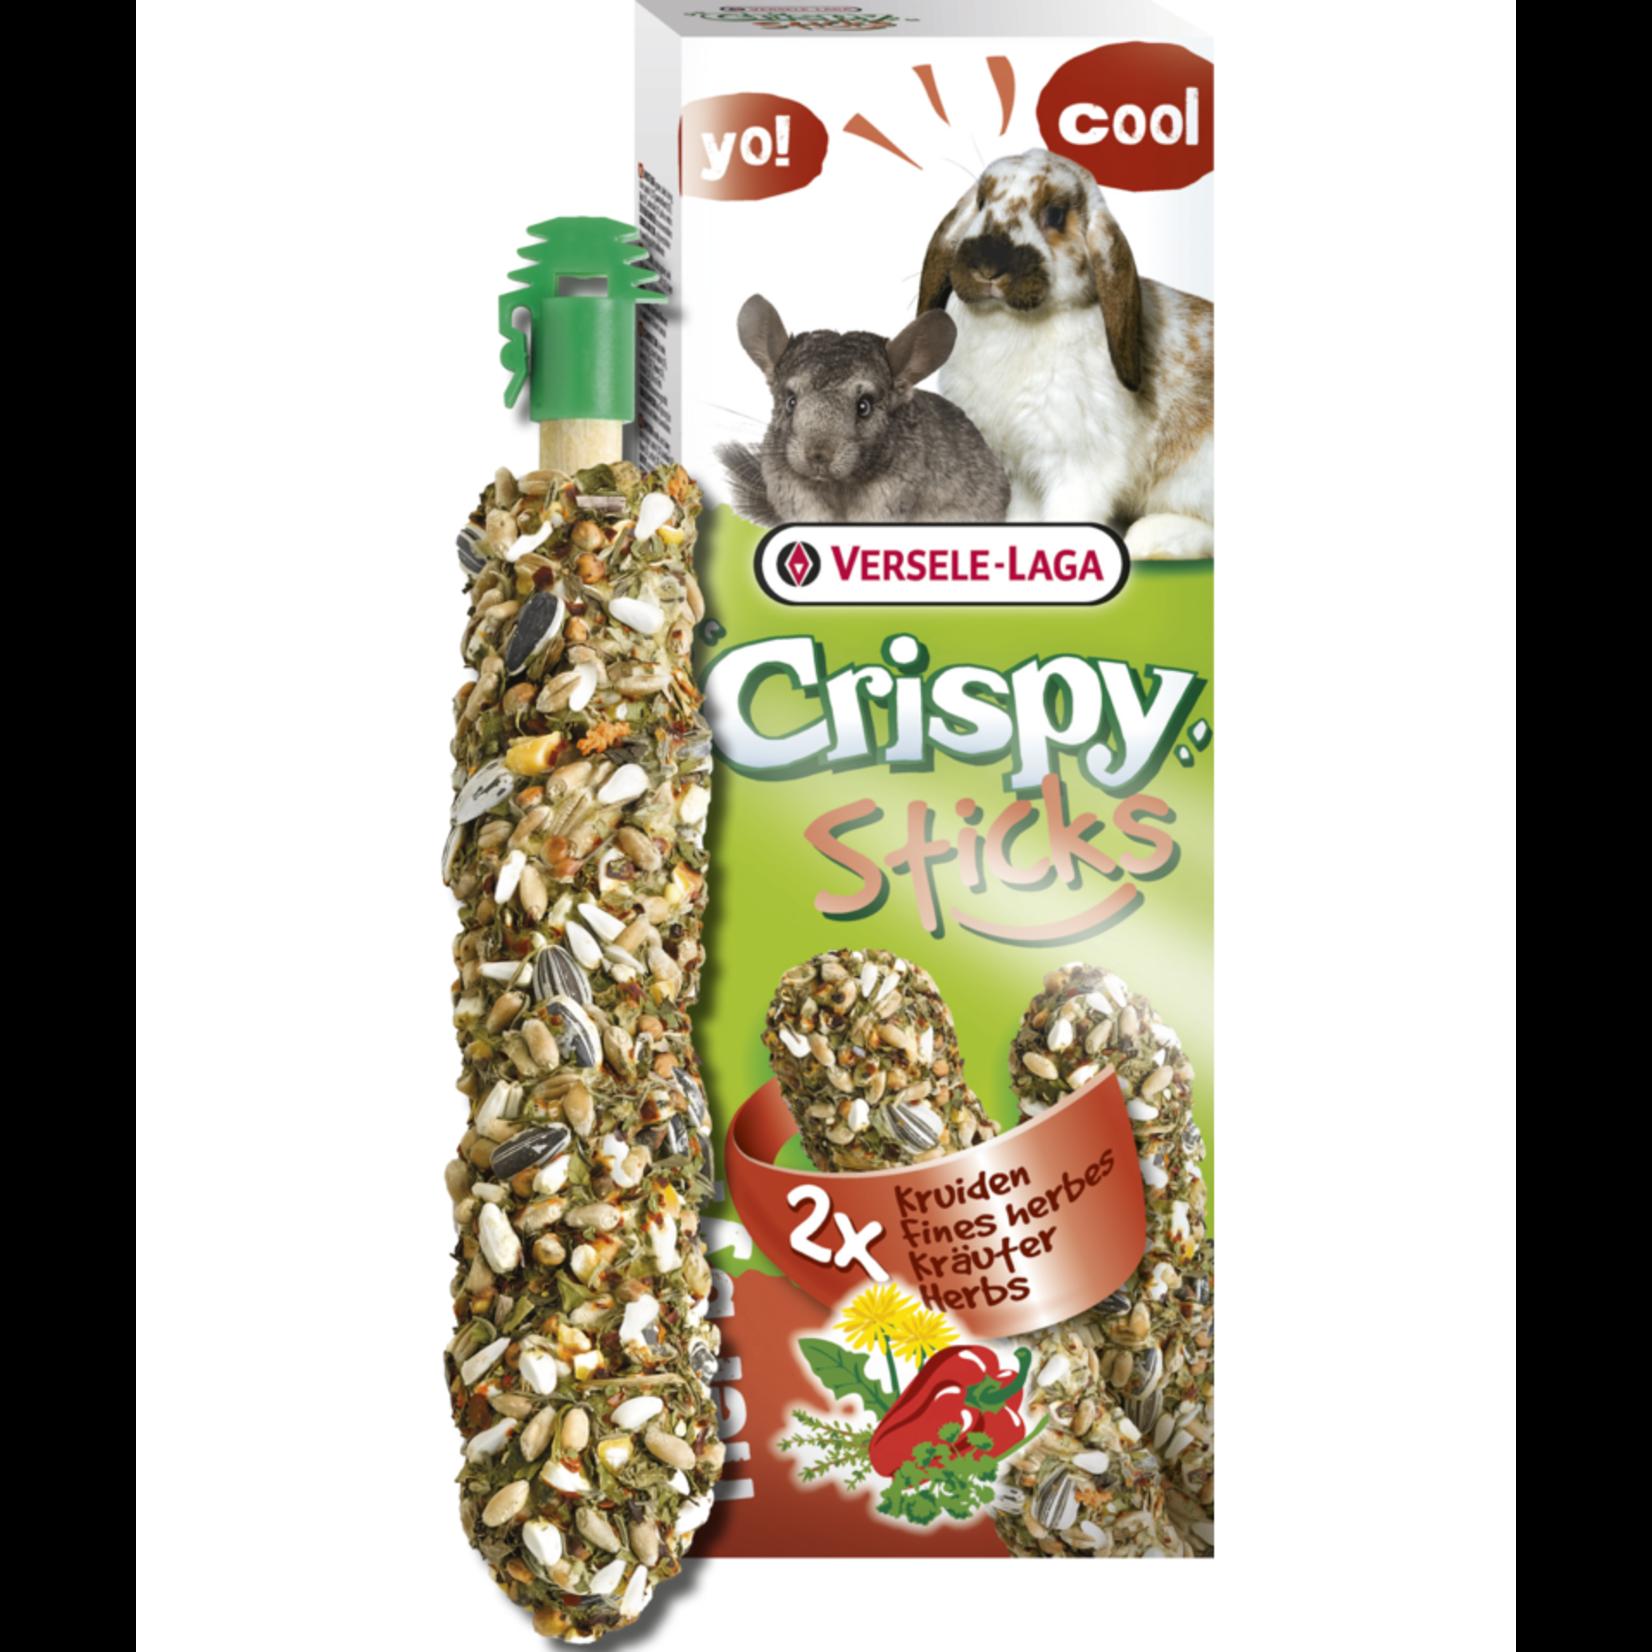 Versele-Laga Crispy Sticks 2x55 Herb